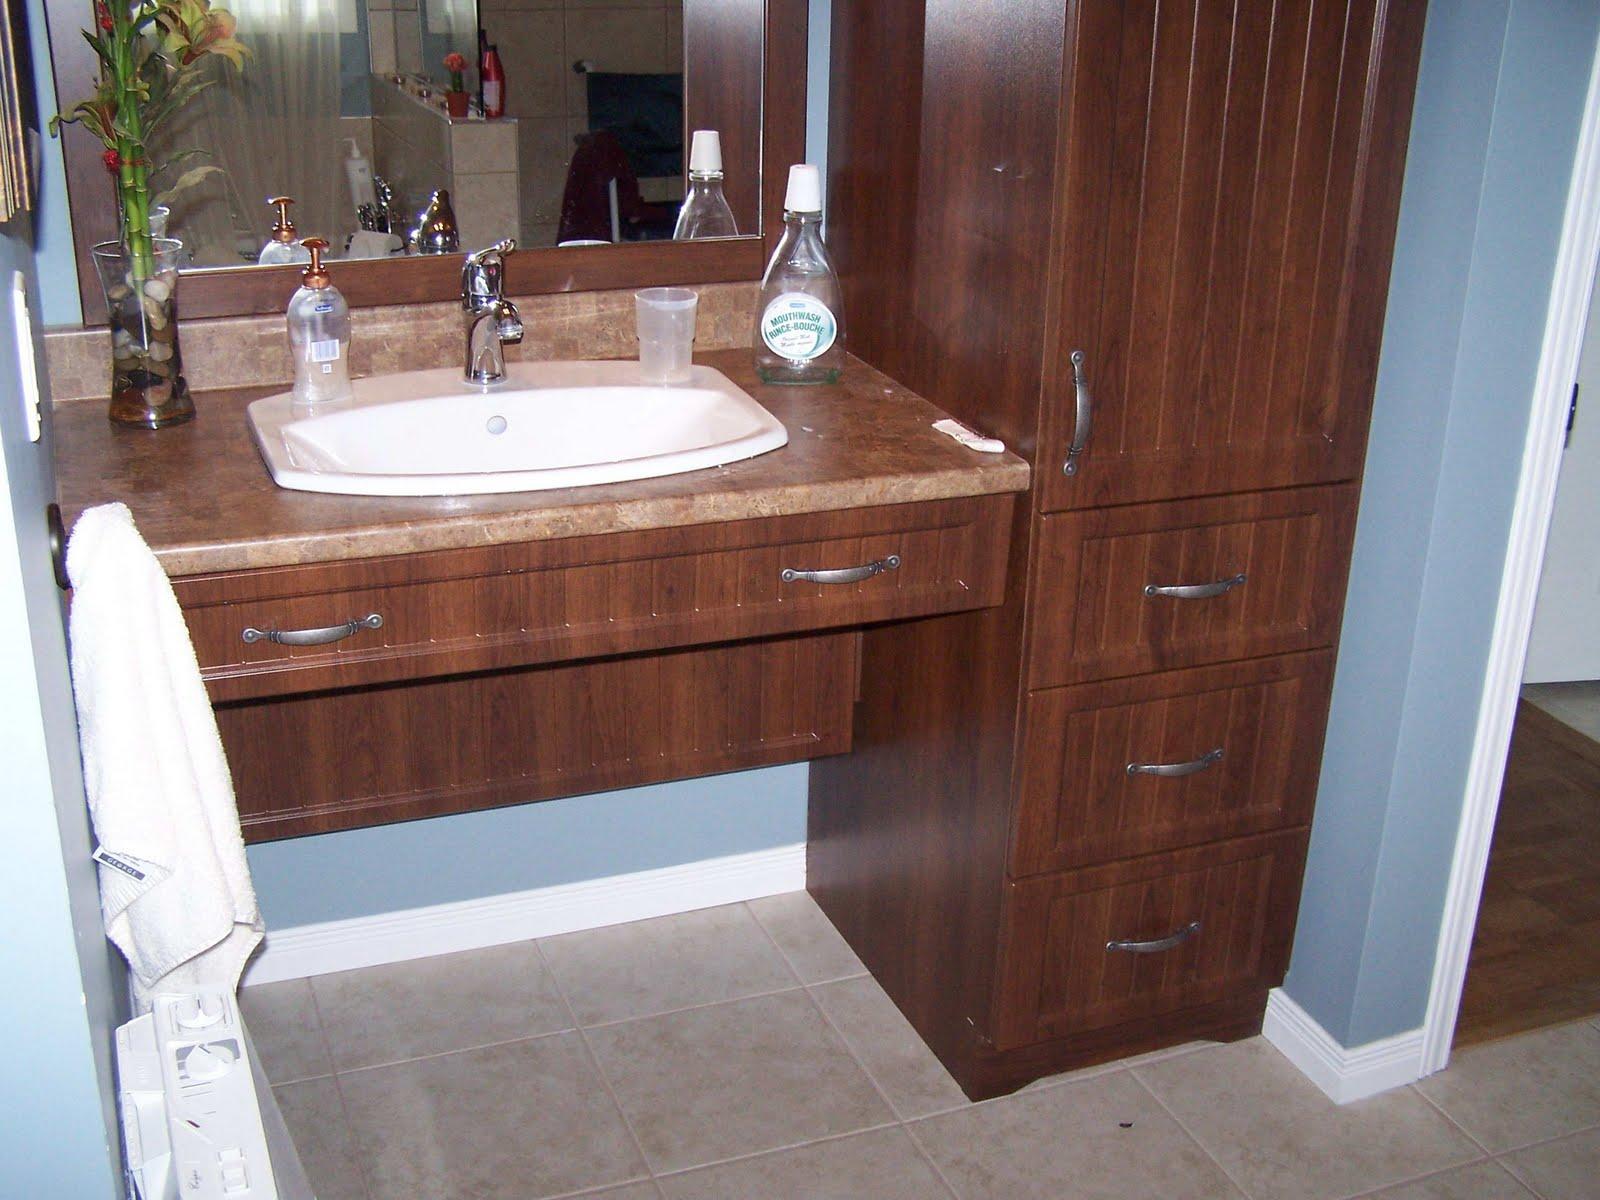 Specialit smm armoire de salle de bain thermoplastique for Comptoir de salle de bain